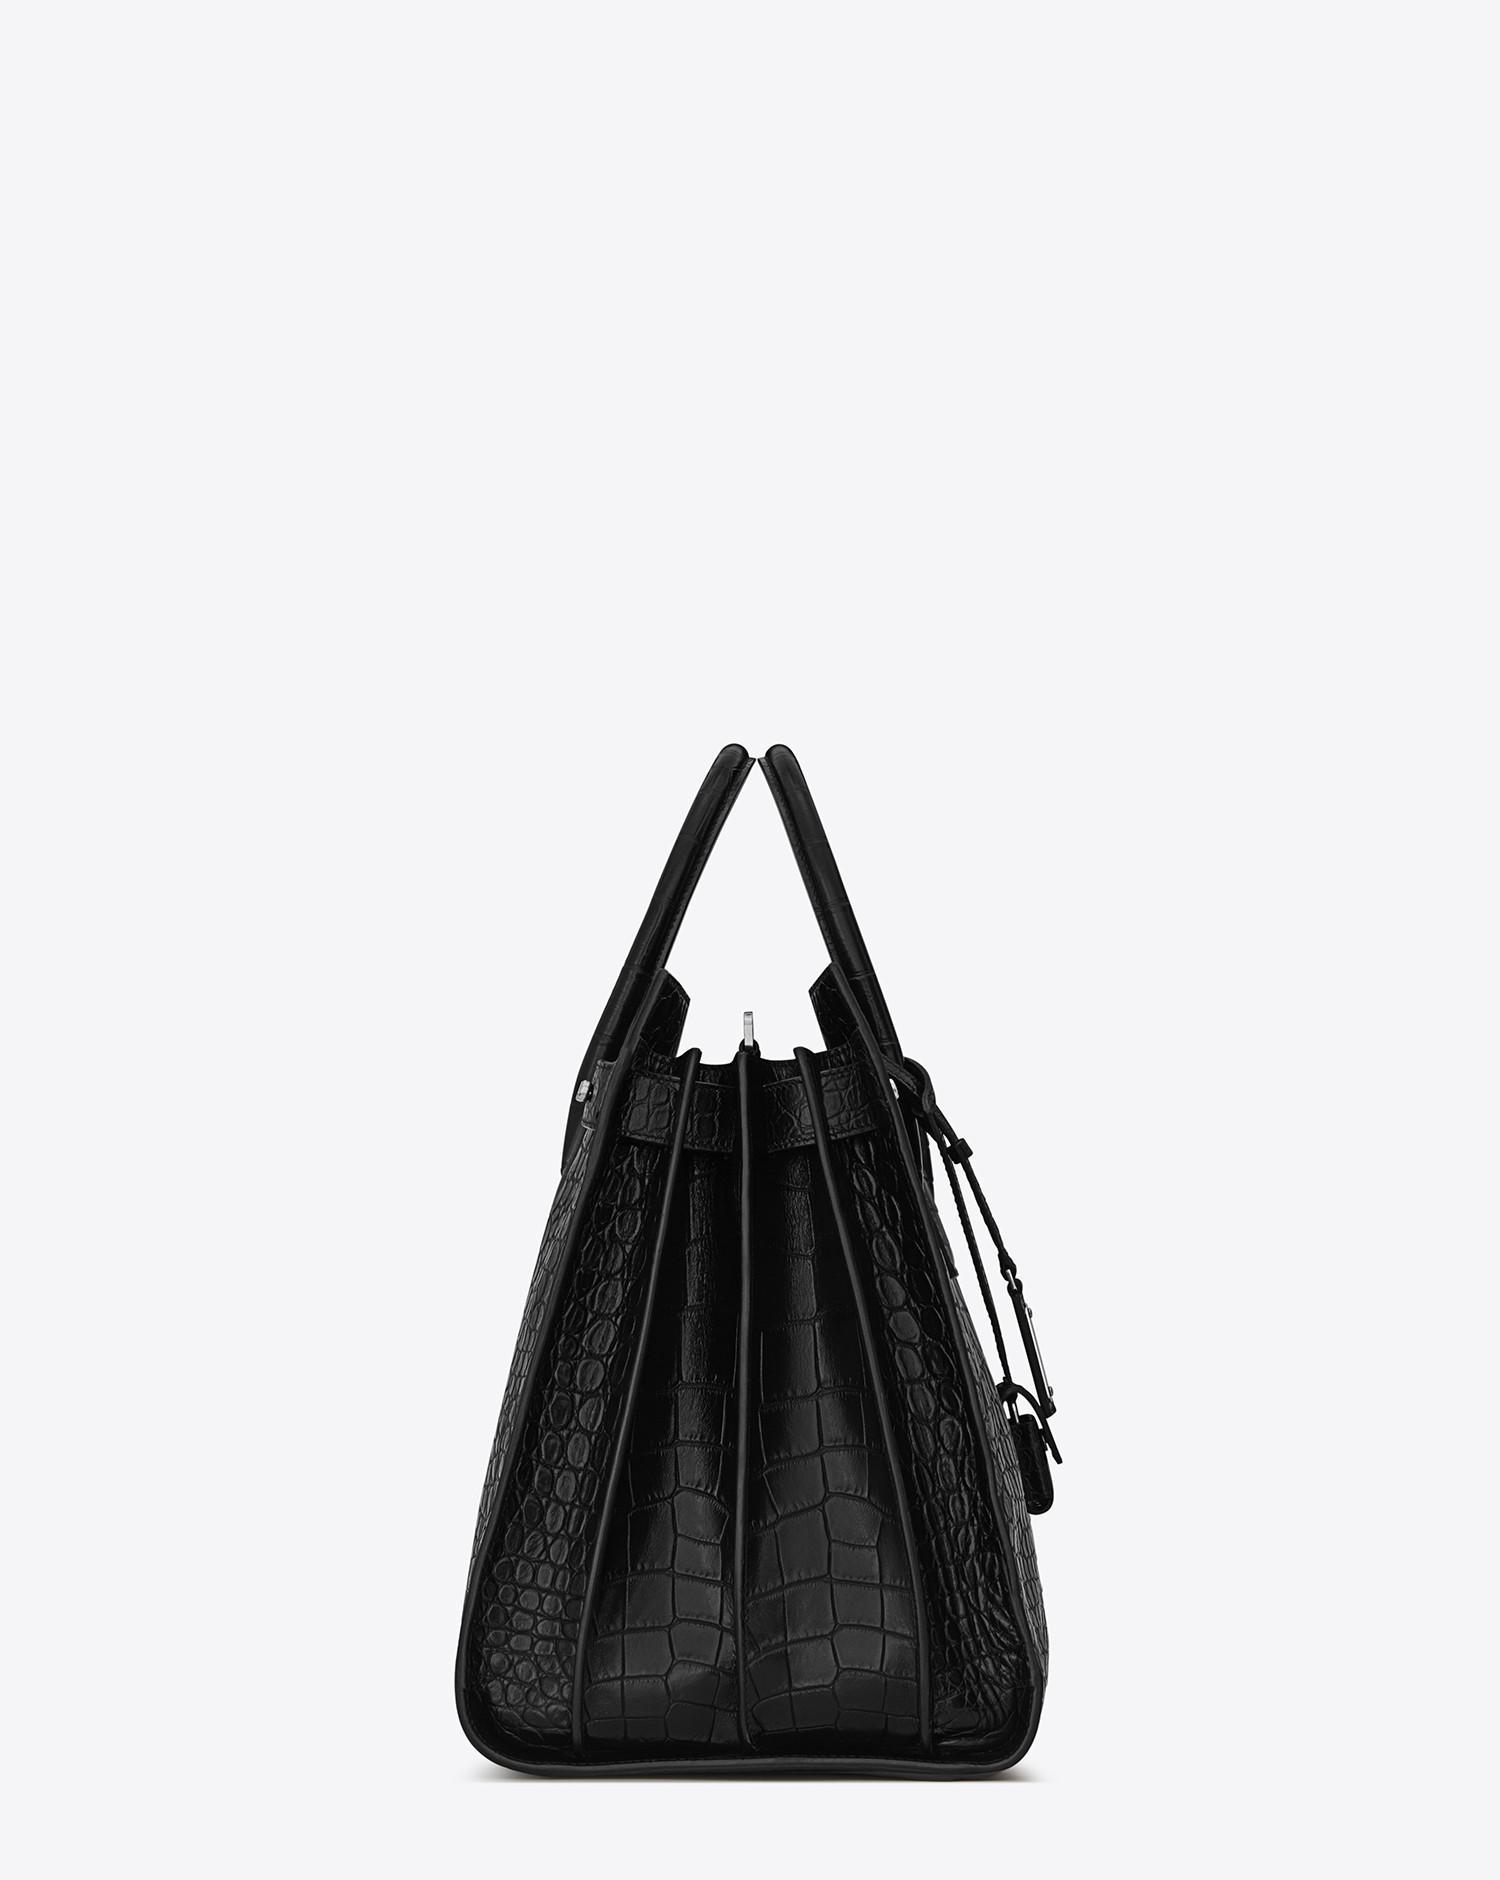 83f6853ed572 Lyst - Saint Laurent Sac De Jour Large In Crocodile Embossed Leather in  Black for Men